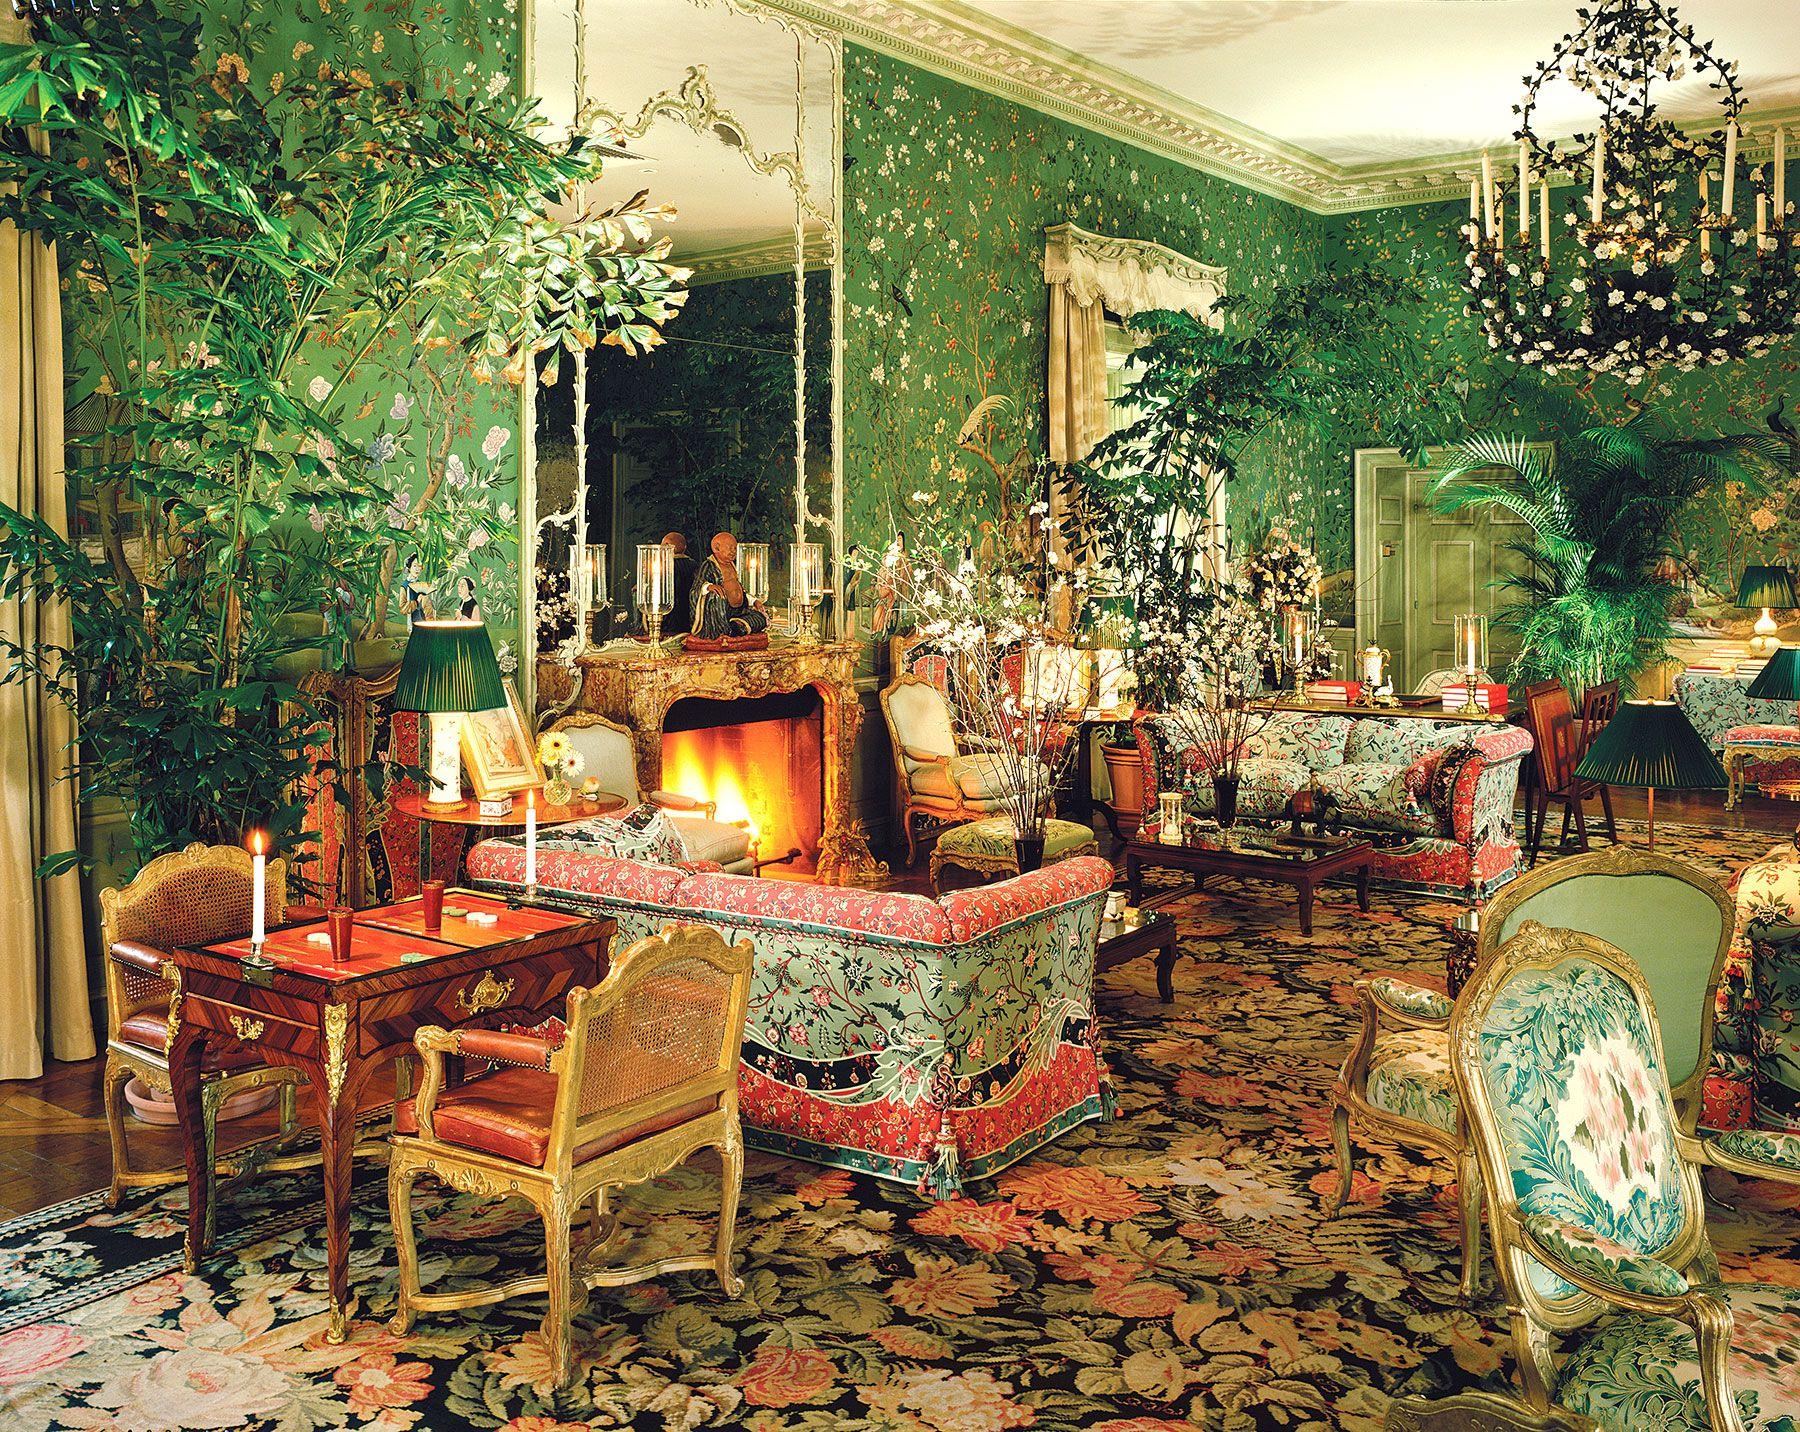 e7b671c0e4101a3cf0b1b131ac64702c - Best Furniture Stores Palm Beach Gardens